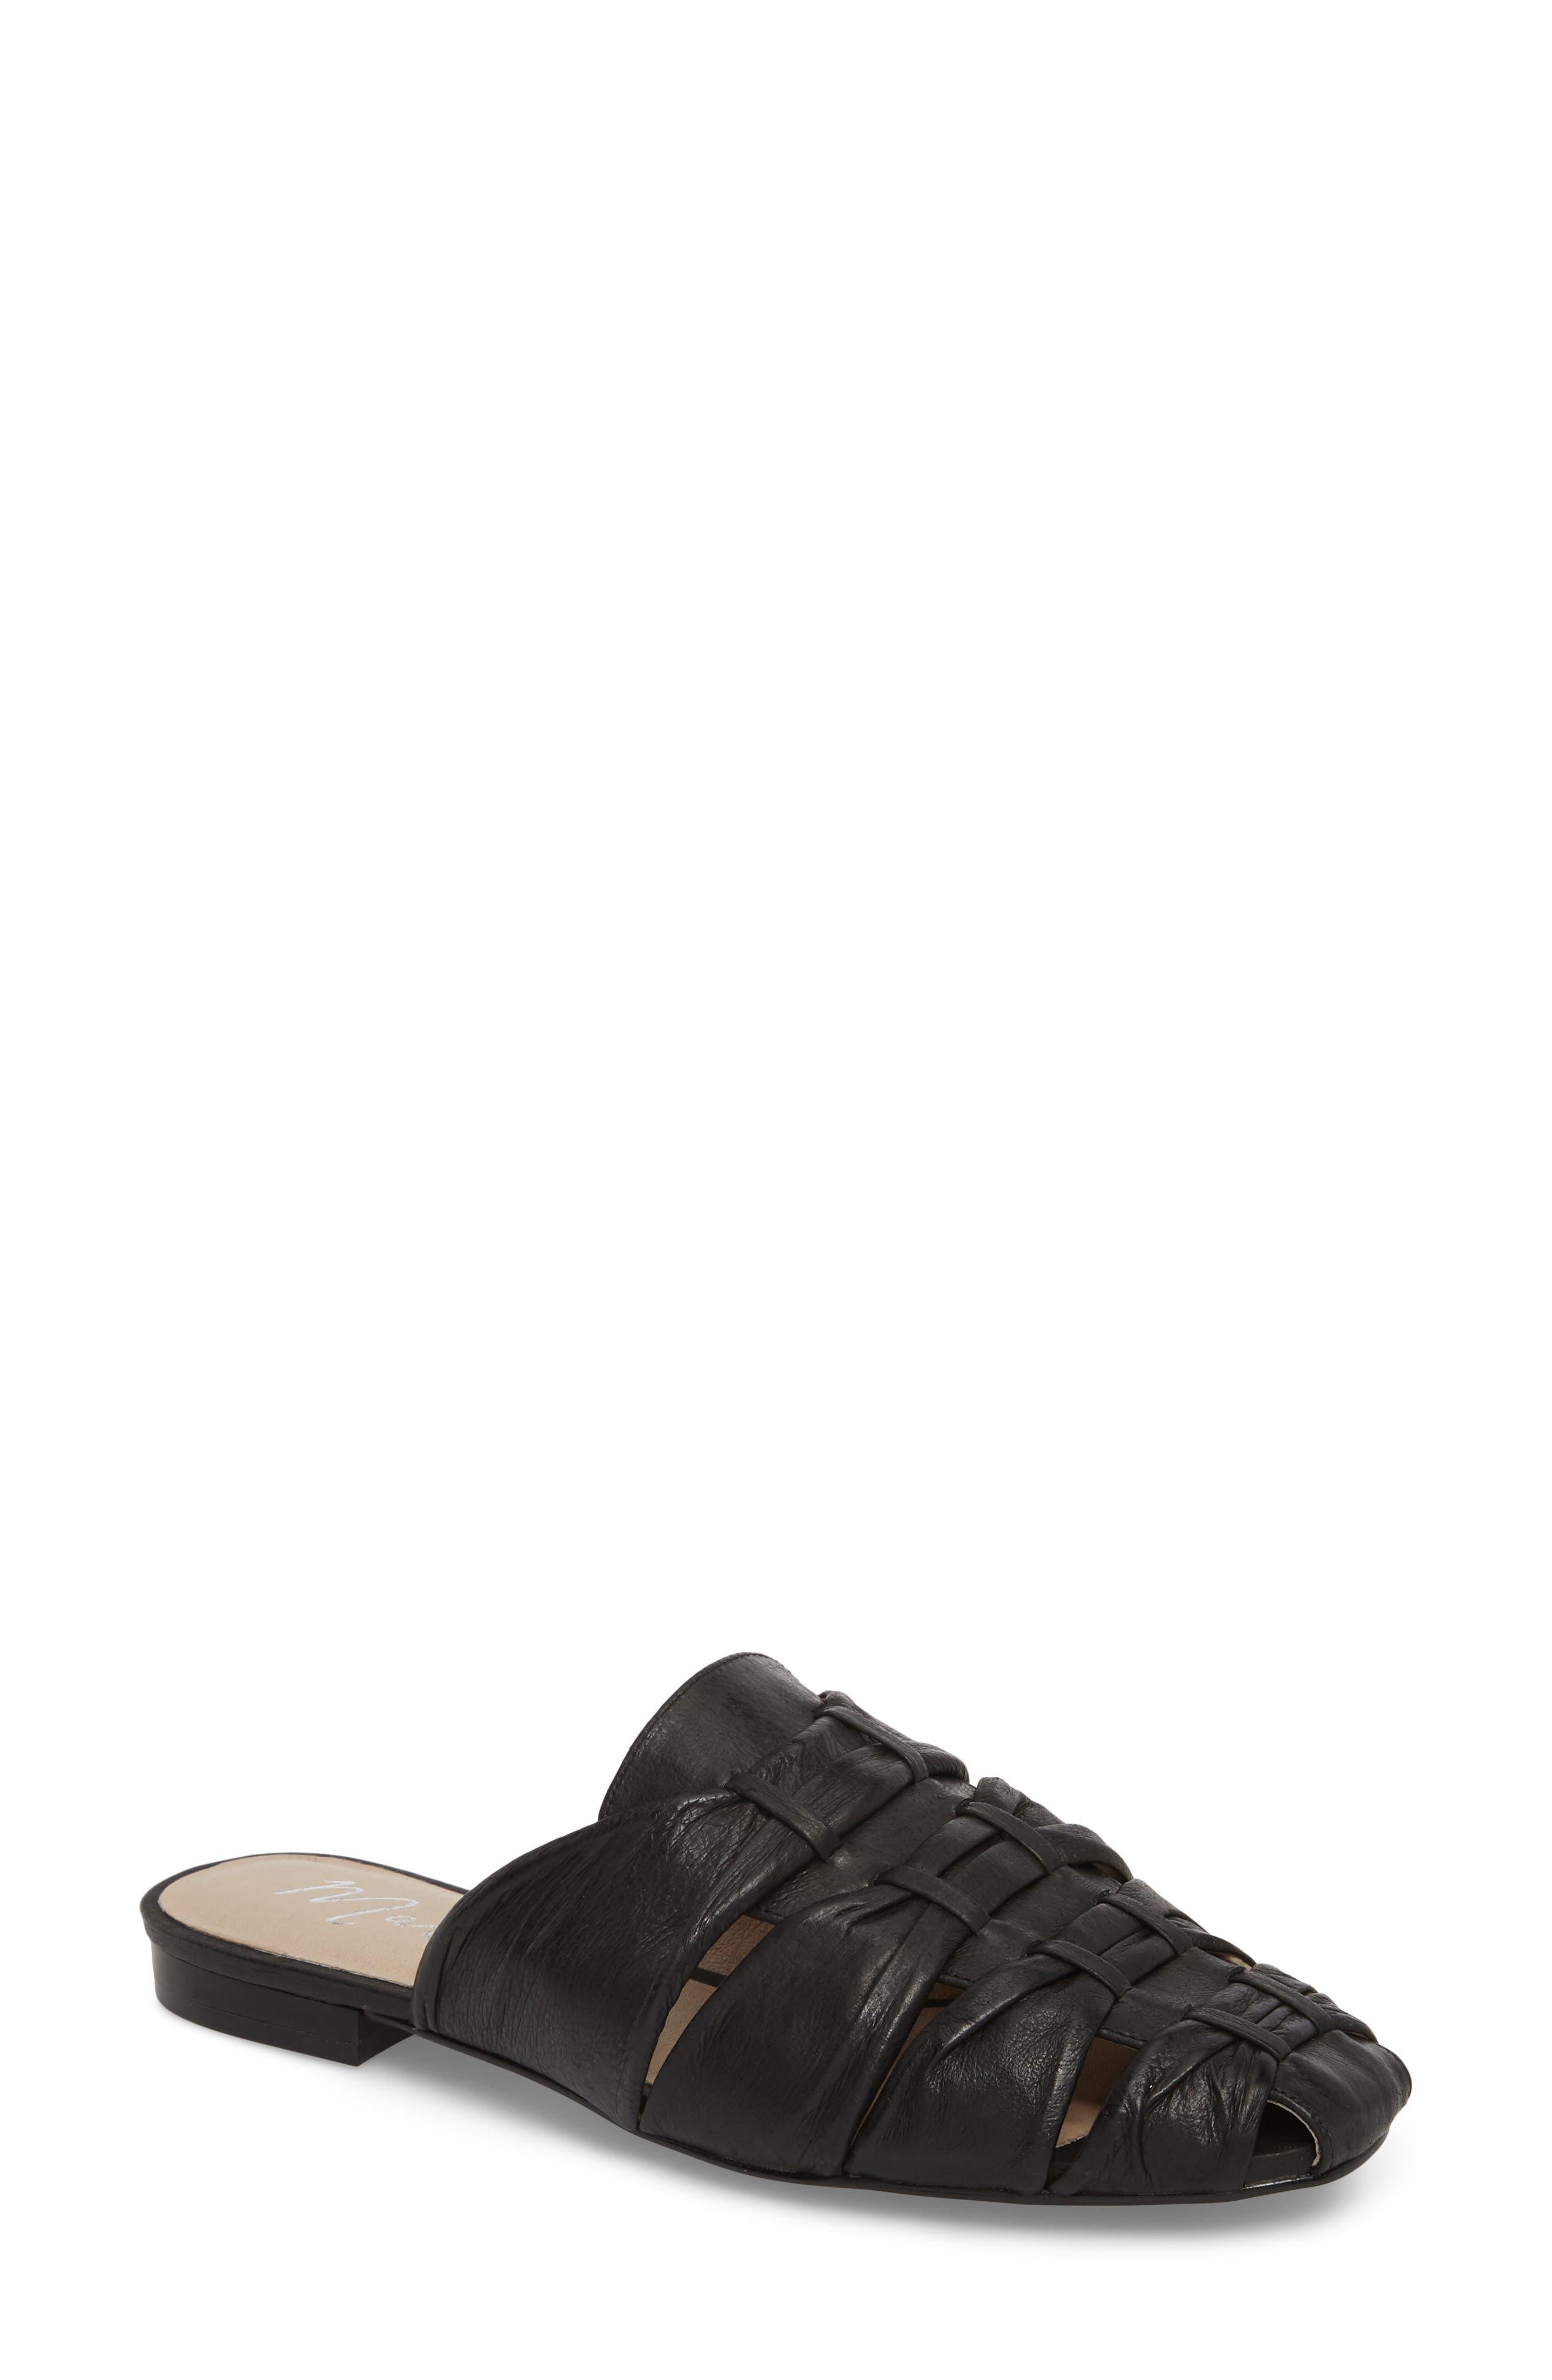 Evangeline Mule,                         Main,                         color, Black Leather